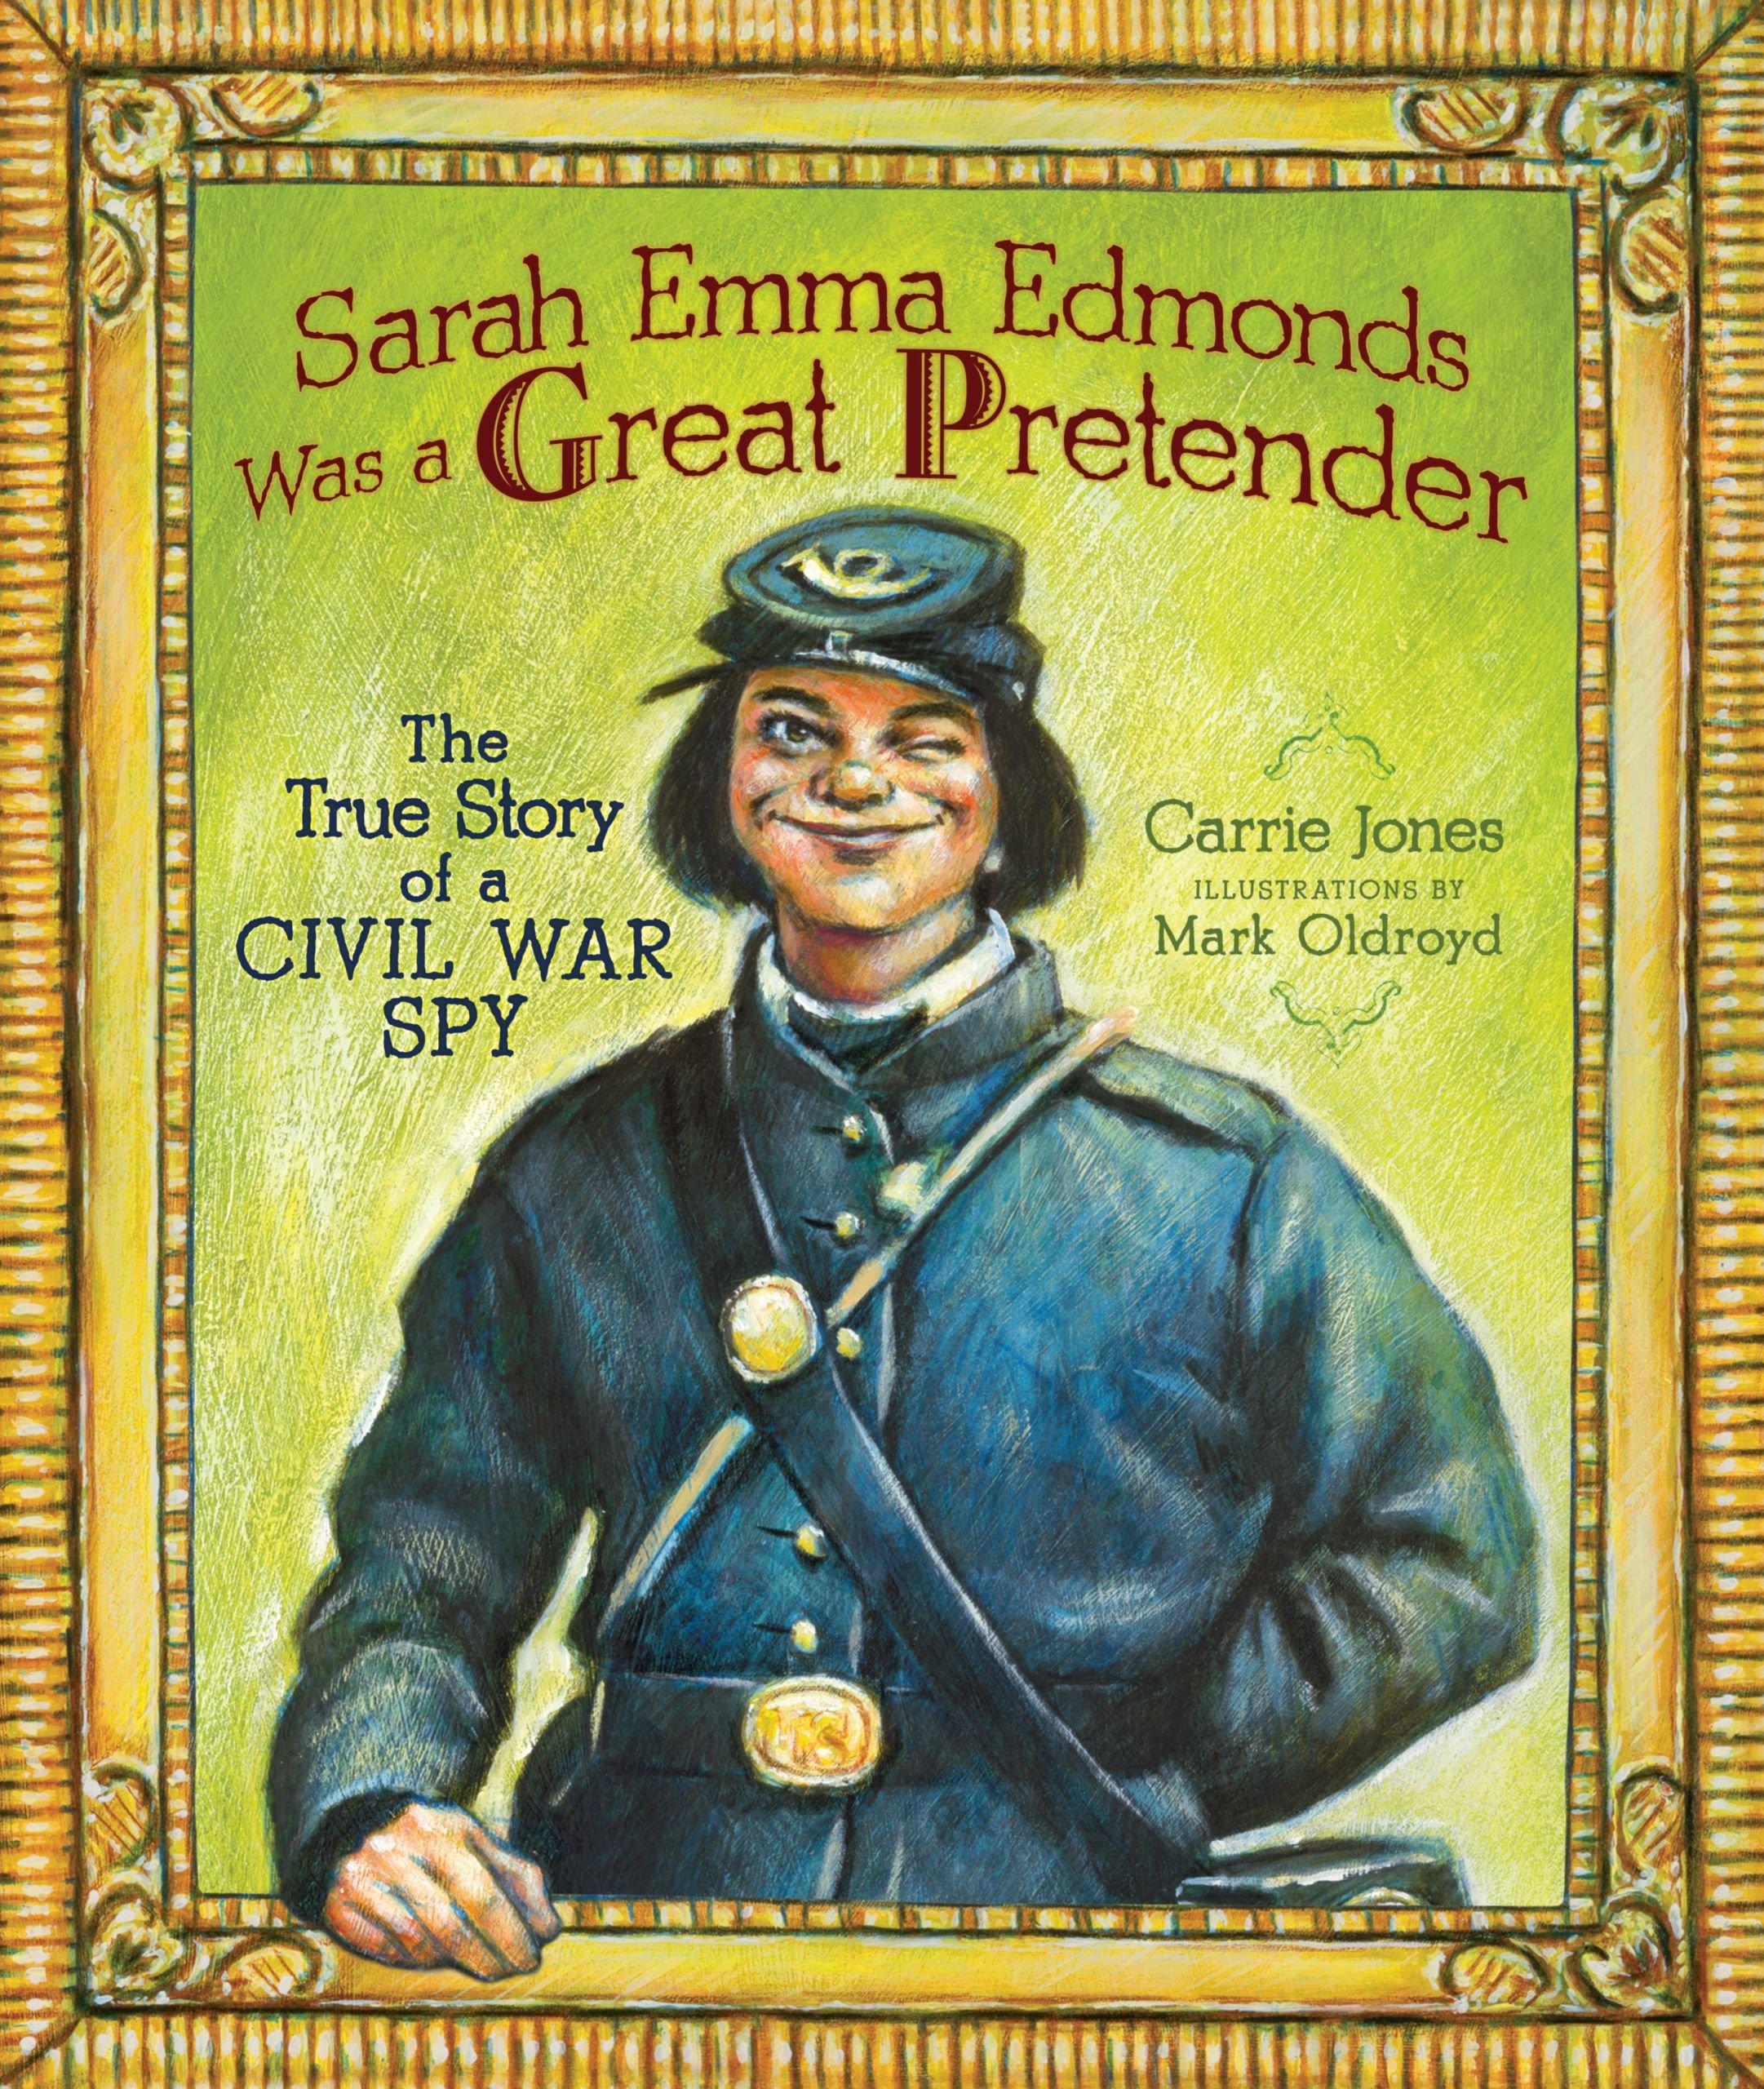 Sarah Emma Edmonds Was a Great Pretender: The True Story of a Civil War Spy (Carolrhoda Picture Books) PDF